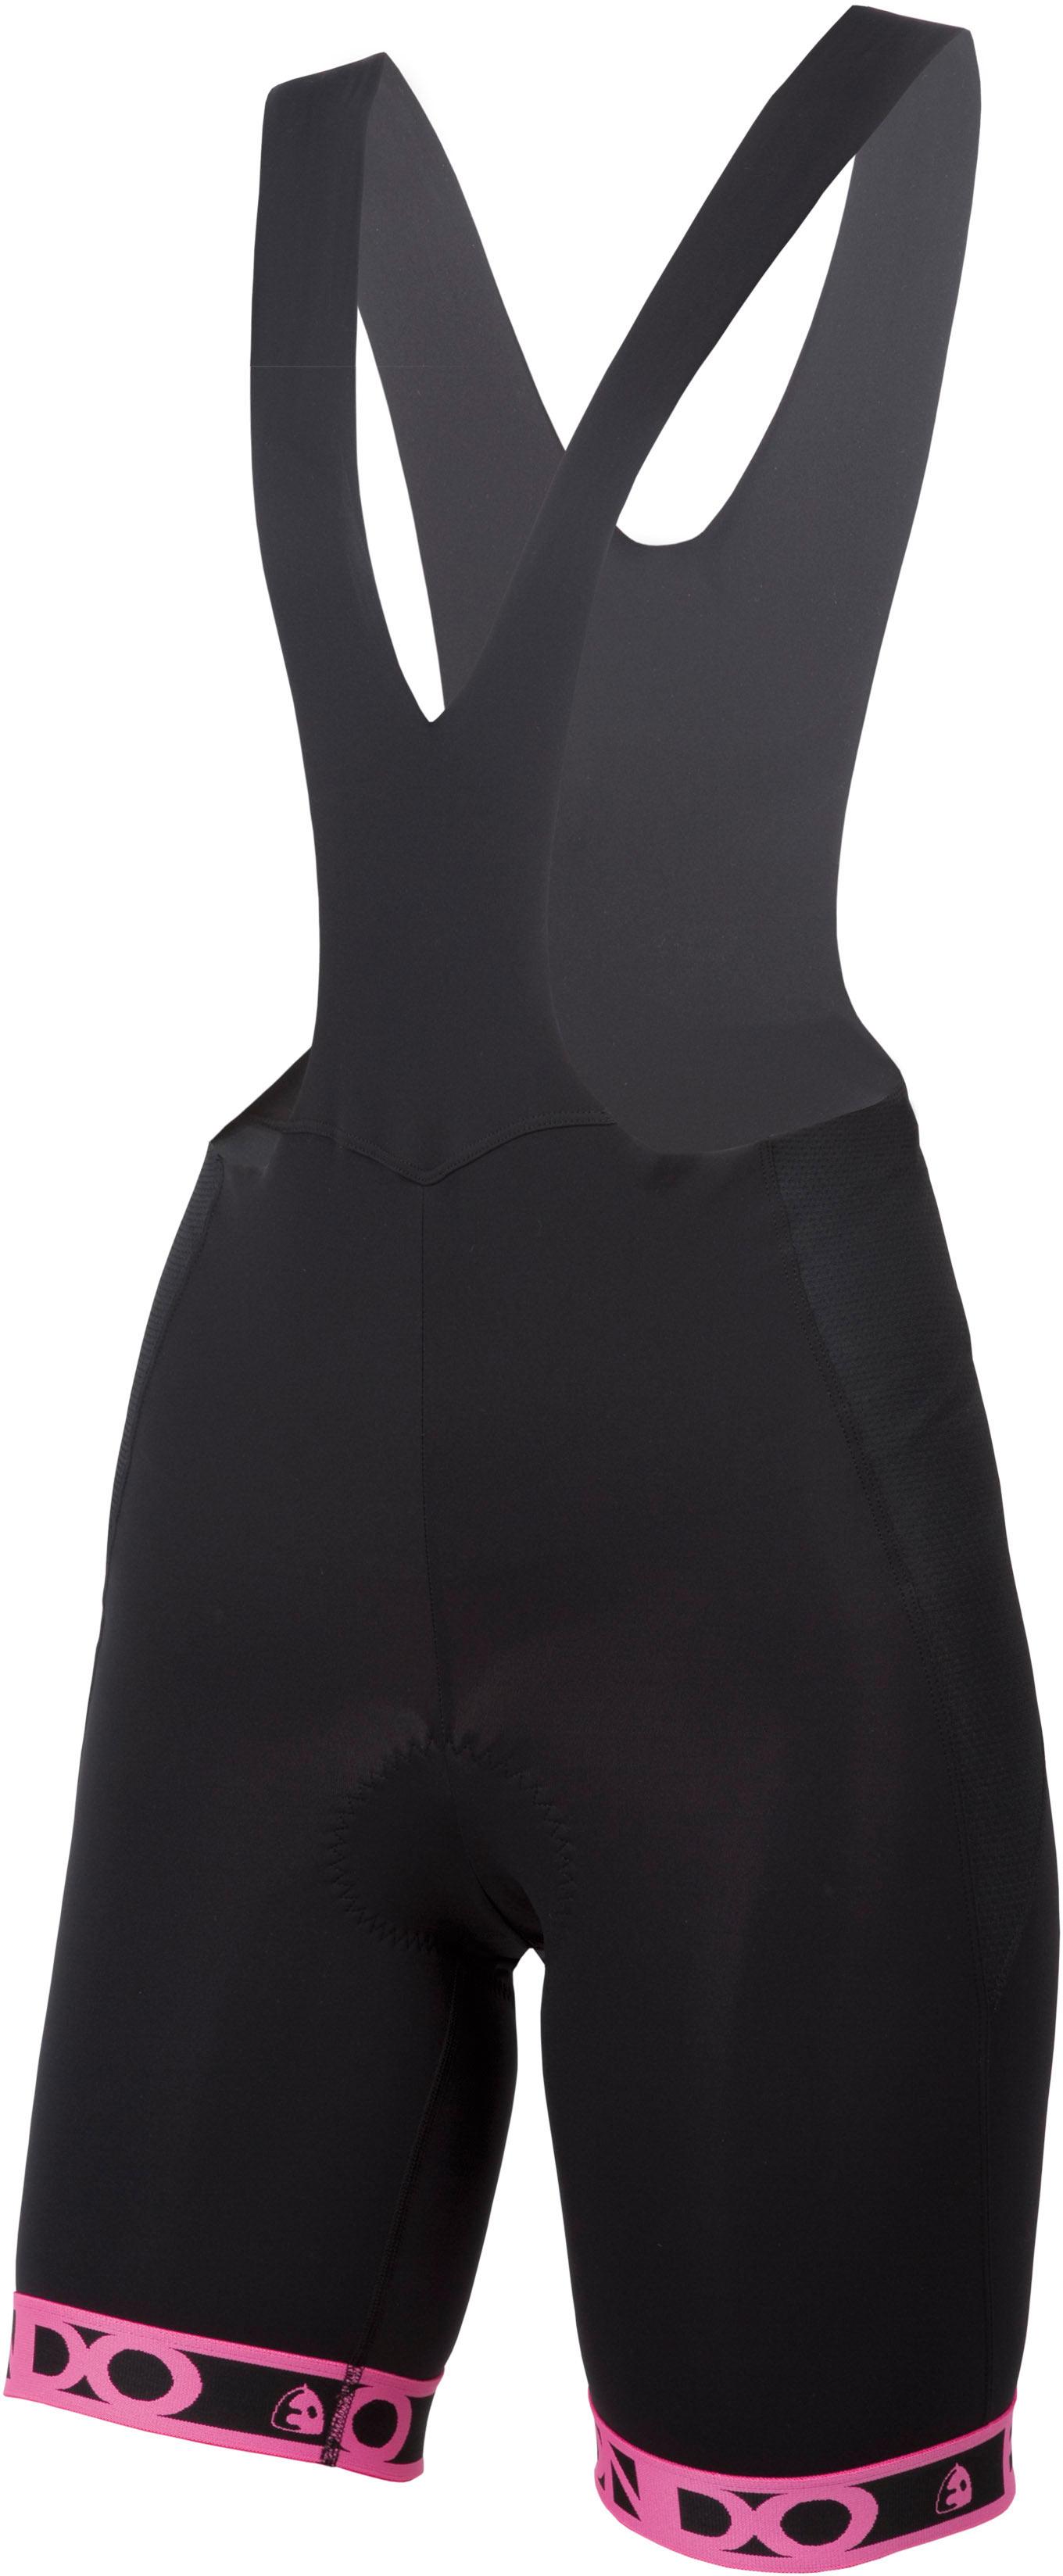 Etxeondo Olaia Bibshort - Womens - Bibshorts - Clothing ... d00e56c38